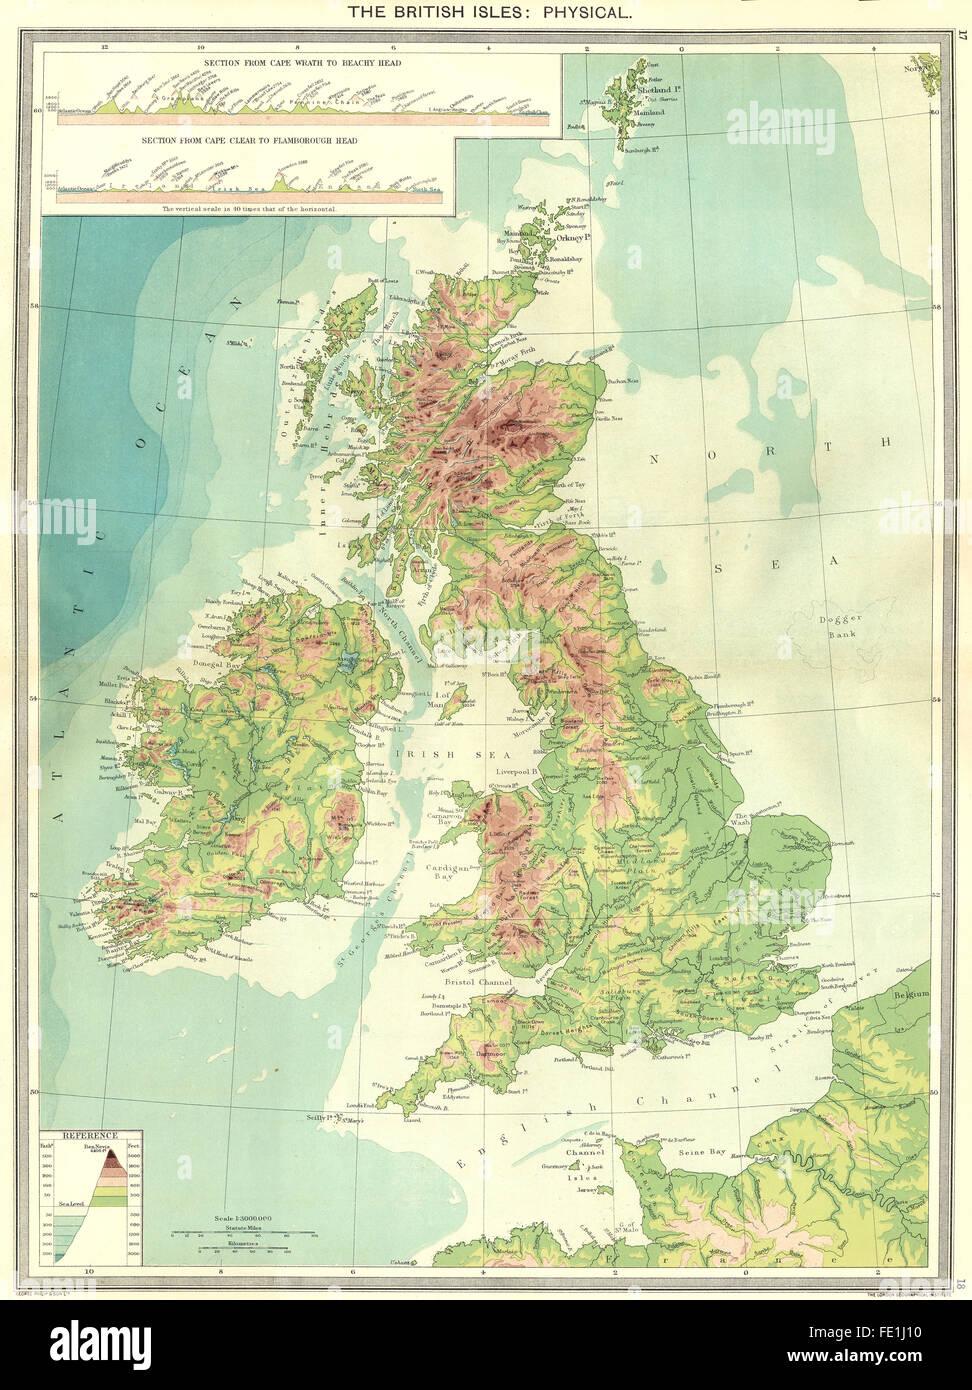 UK: The British Isles: Physical, 1907 antique map Stock Photo ...